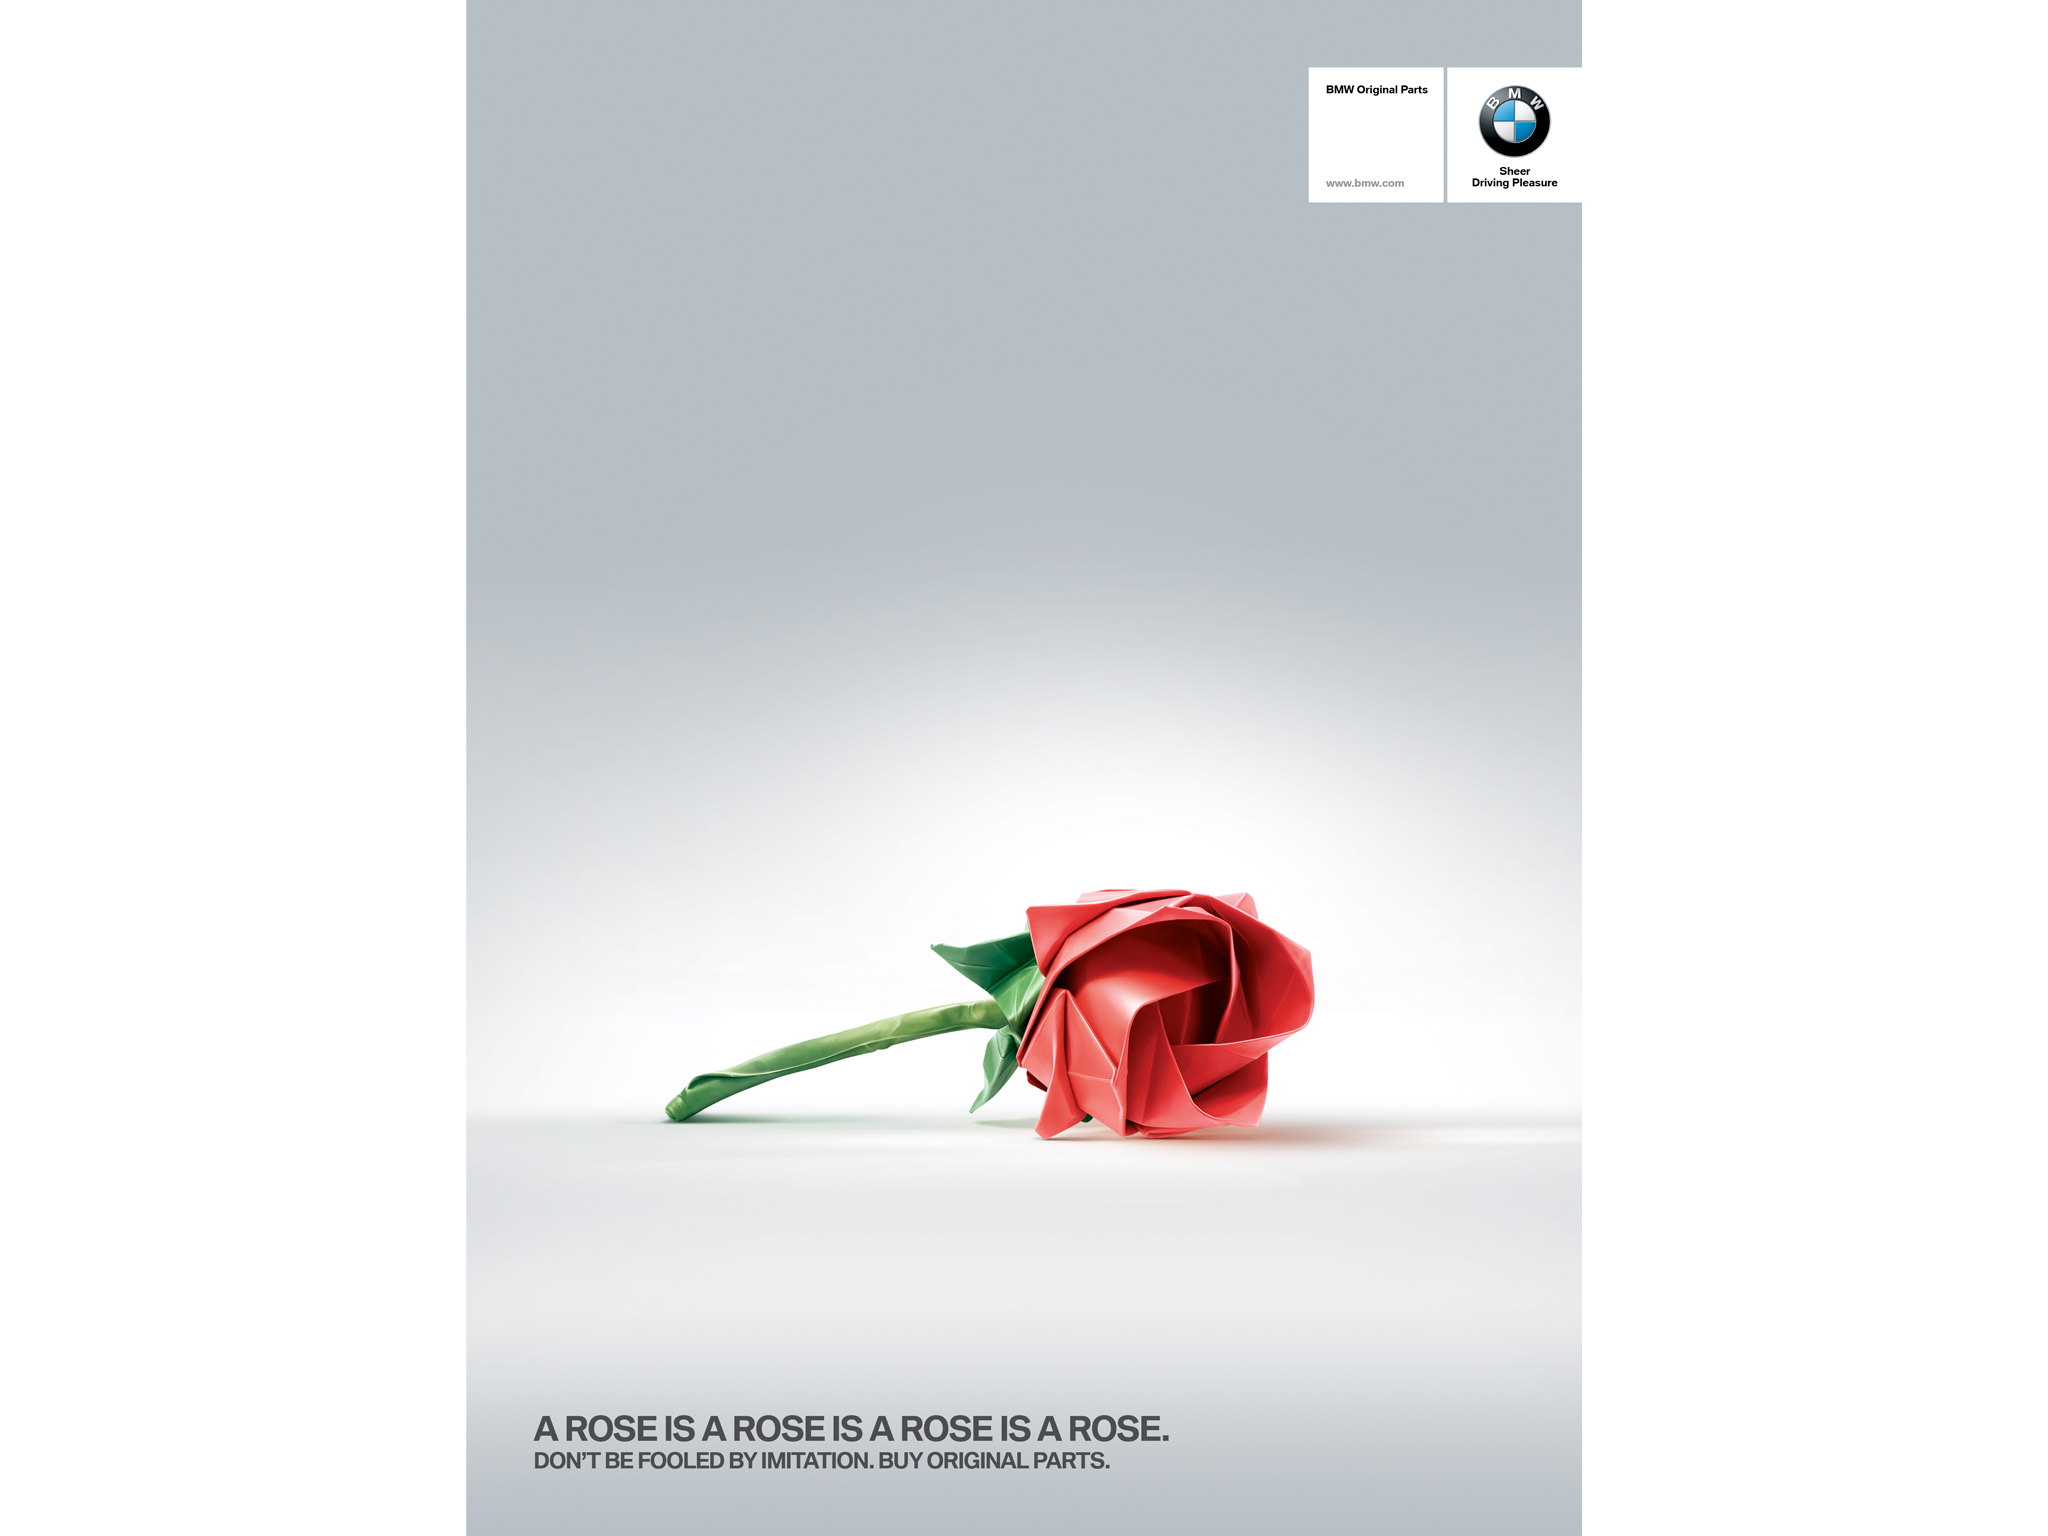 Print_Platinum_BMW_OP_Rose.jpg